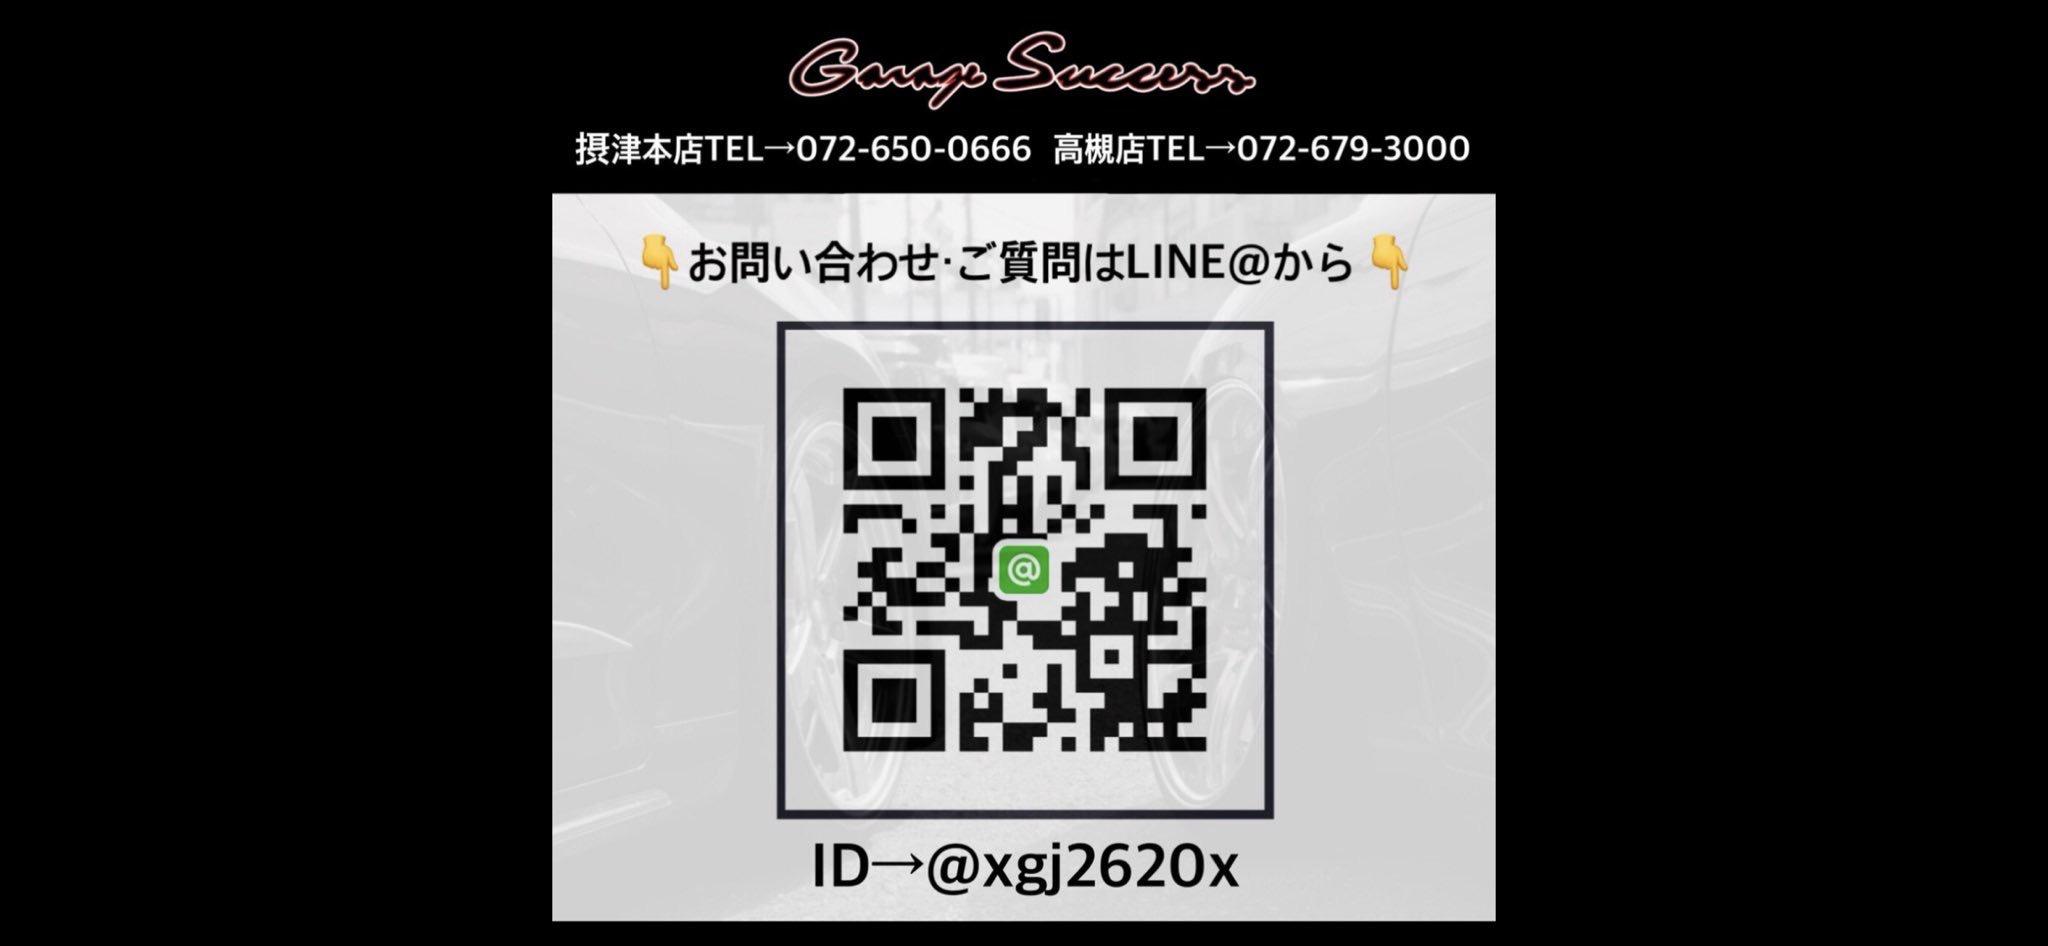 BEFFE915-EF7F-49B6-A623-3055247CBF1B